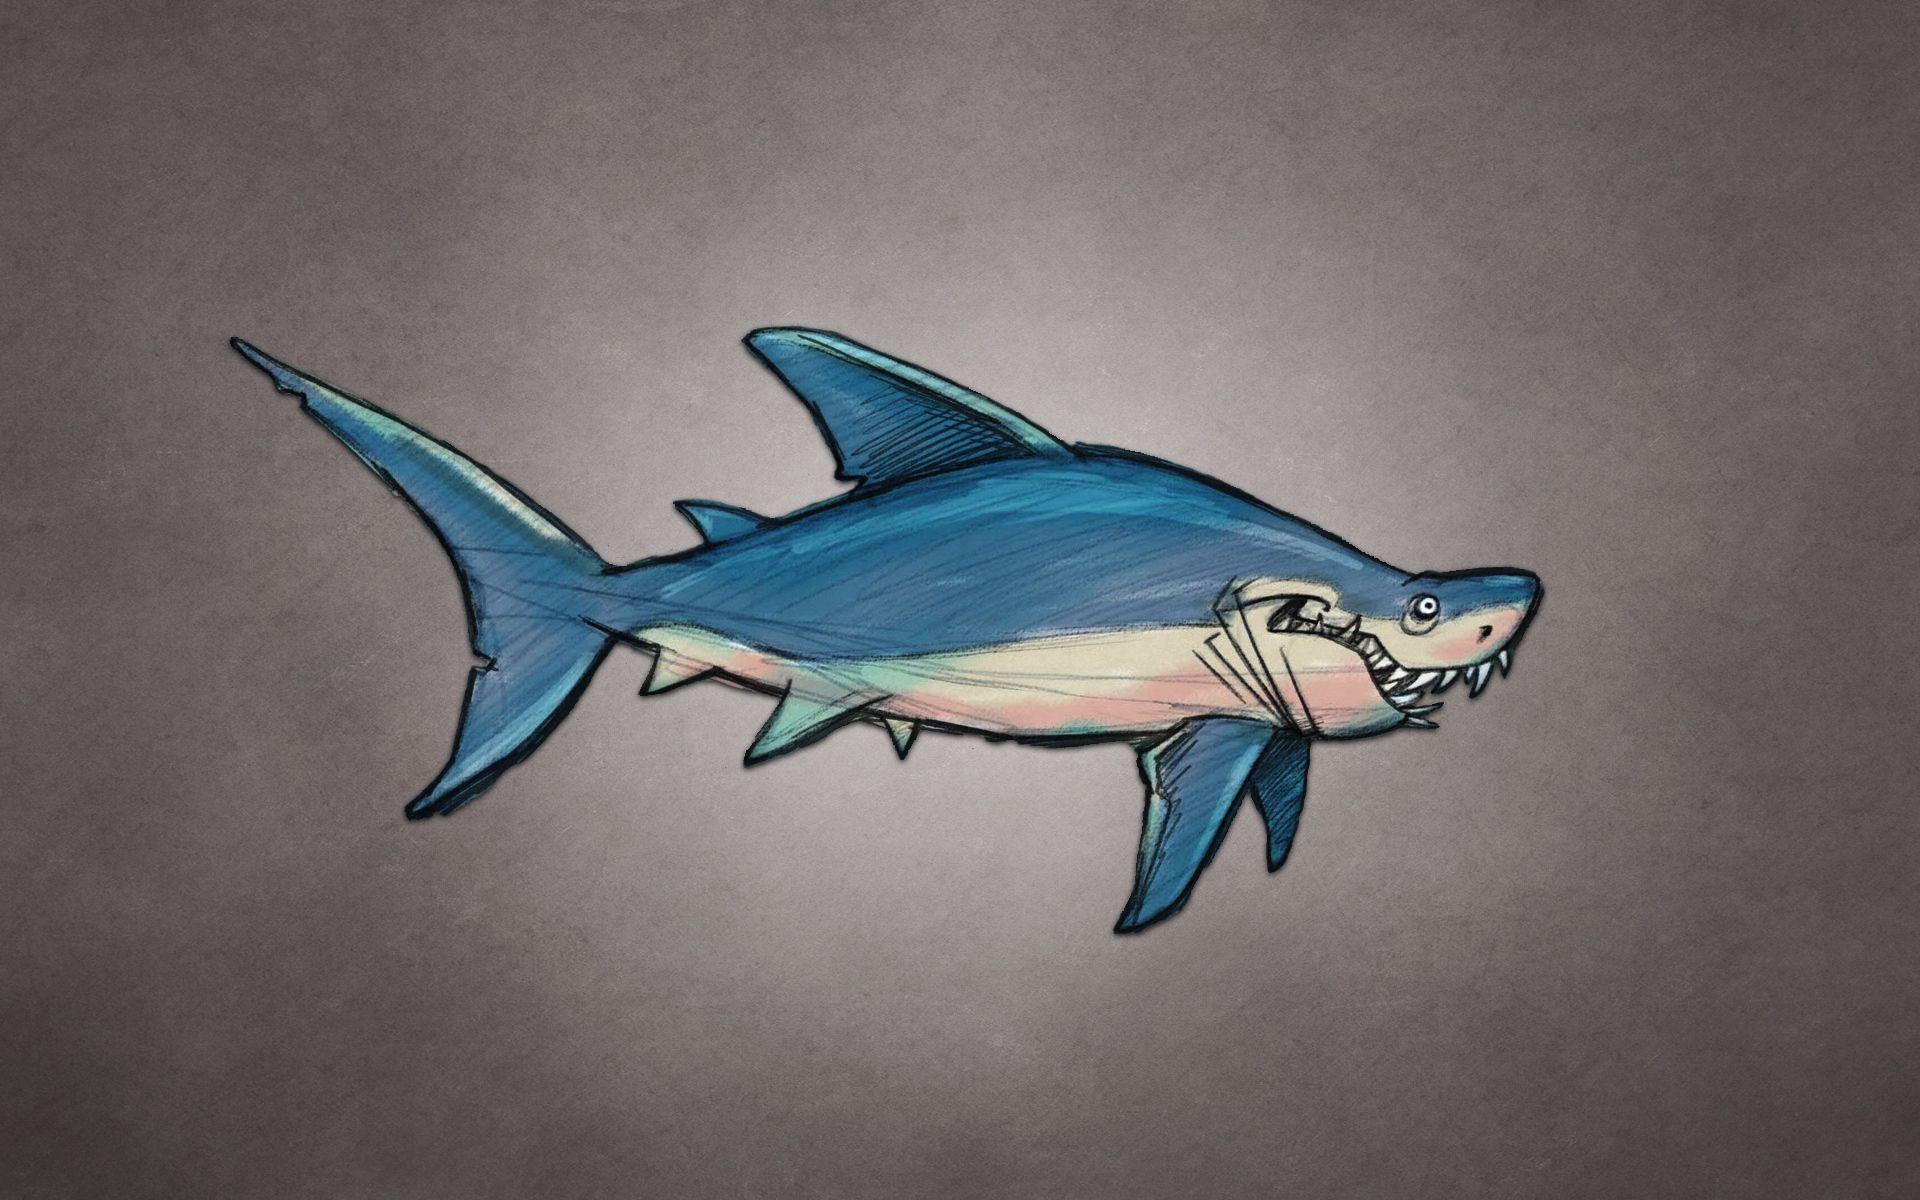 152452 free wallpaper 480x800 for phone, download images Art, Predator, Fish, Shark 480x800 for mobile